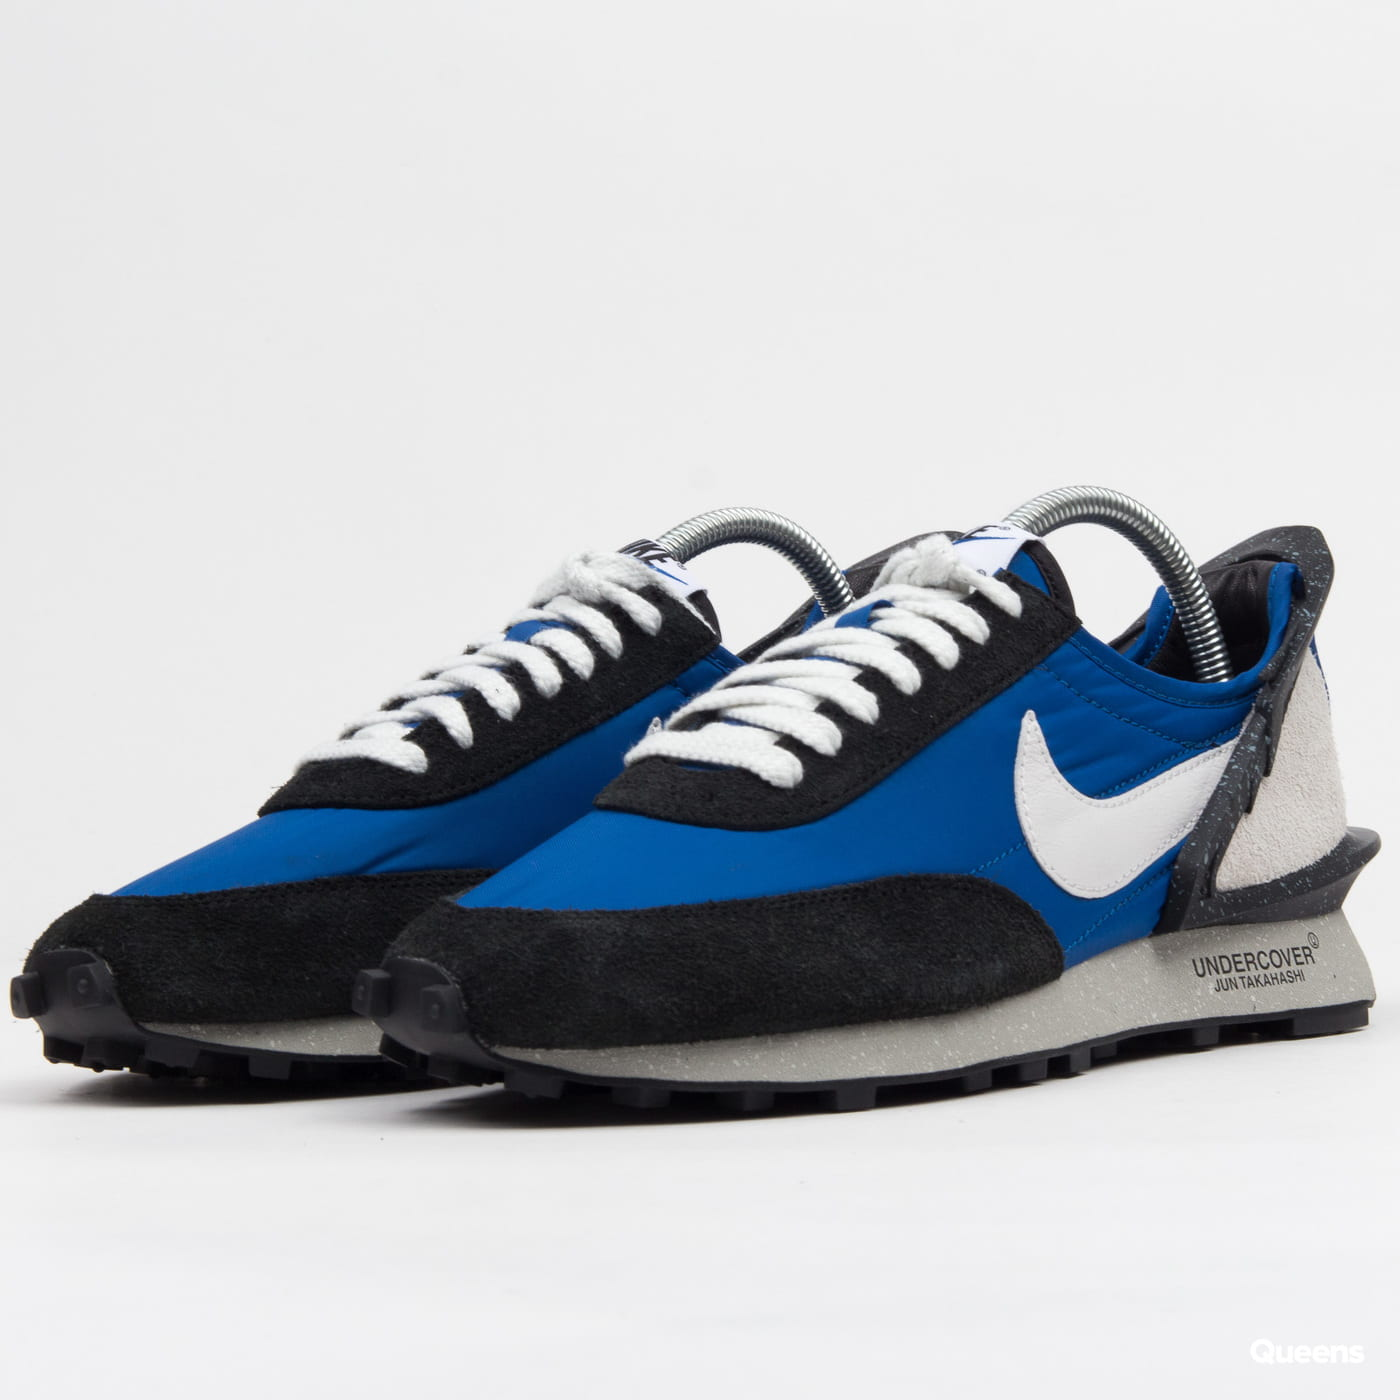 Nike Dbreak / Undercover blue jay / summit white - black